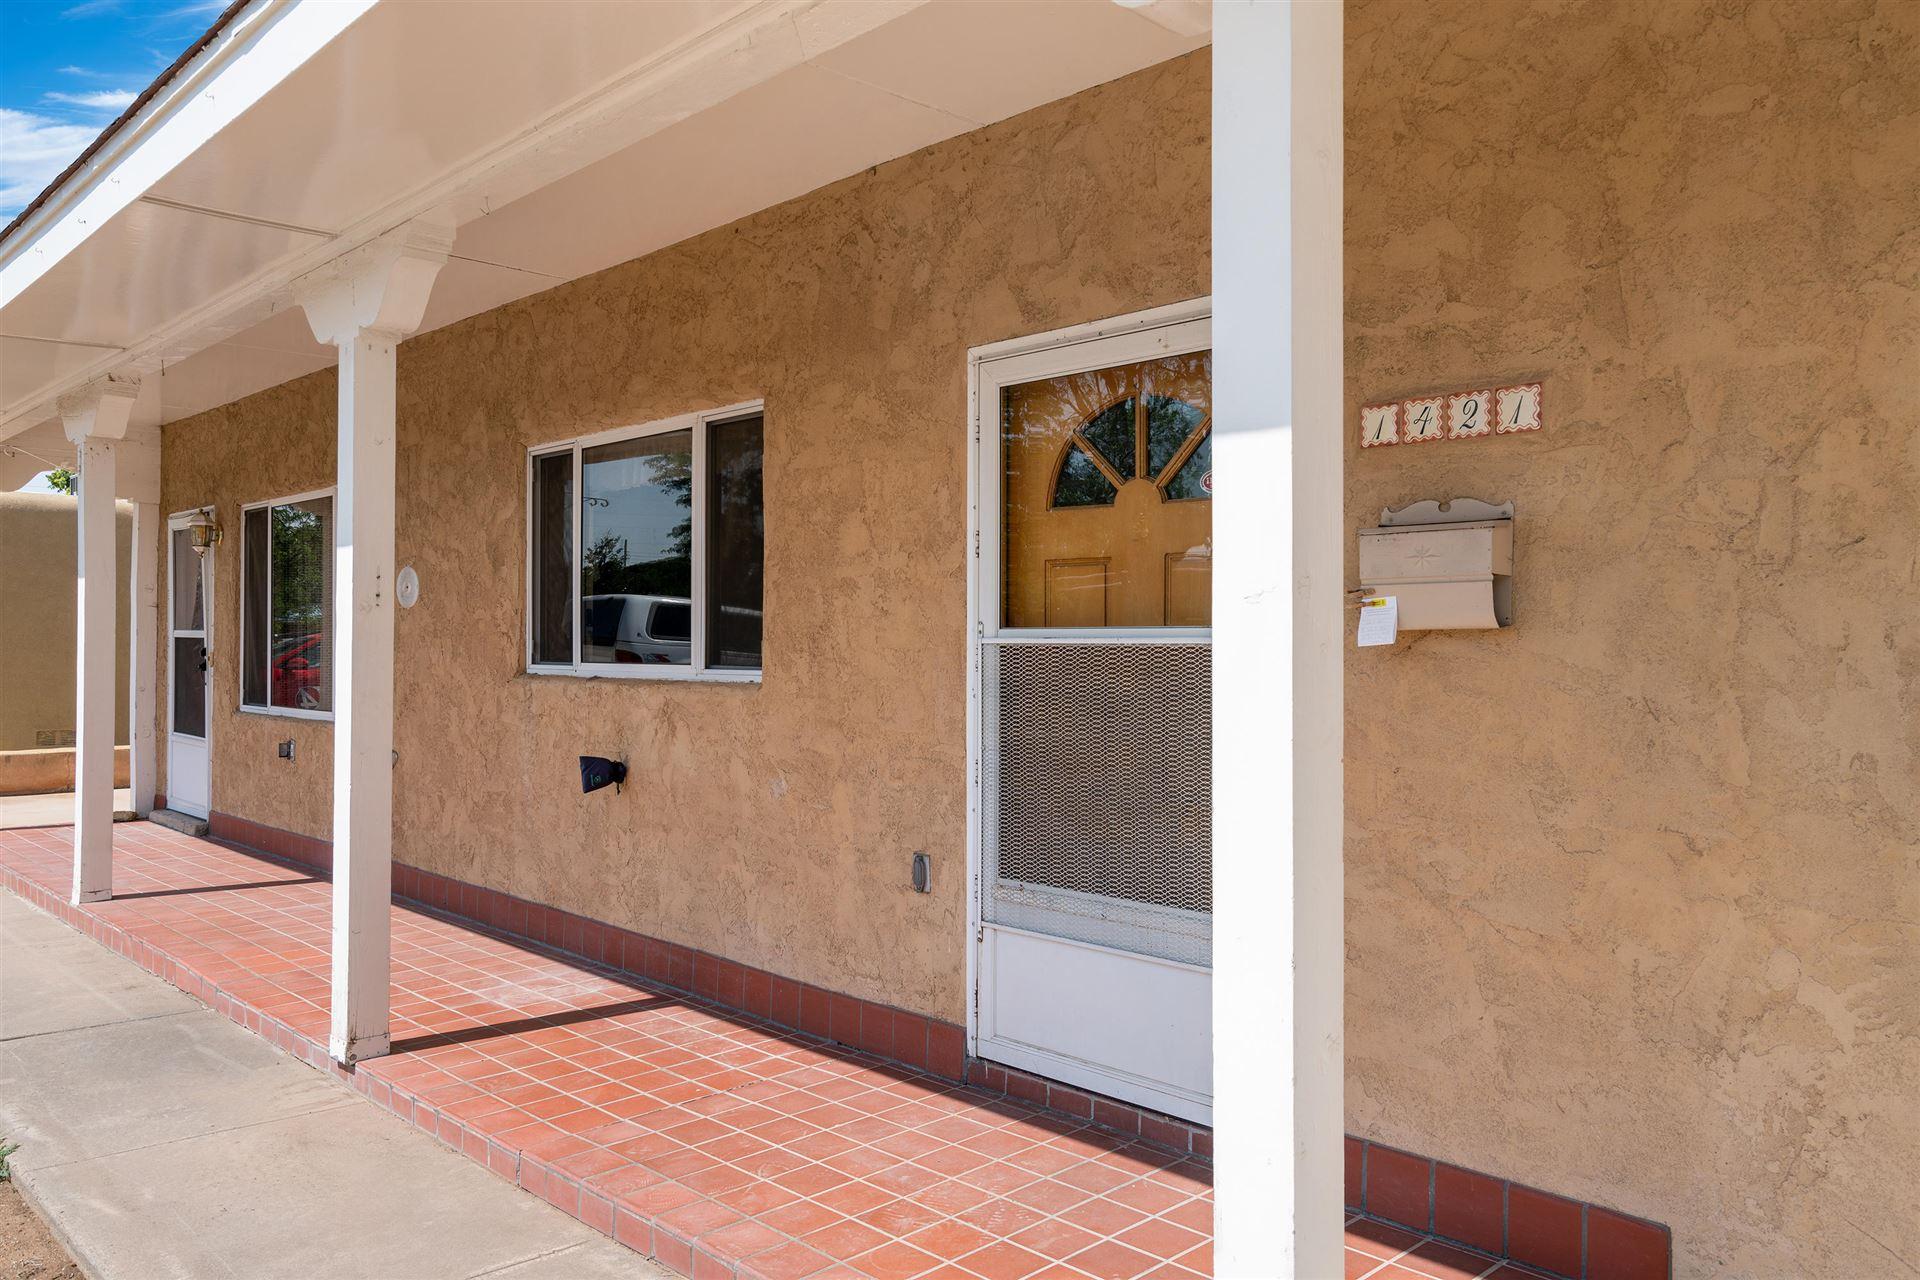 Photo of 1421 KATIE Street NE, Albuquerque, NM 87110 (MLS # 994757)